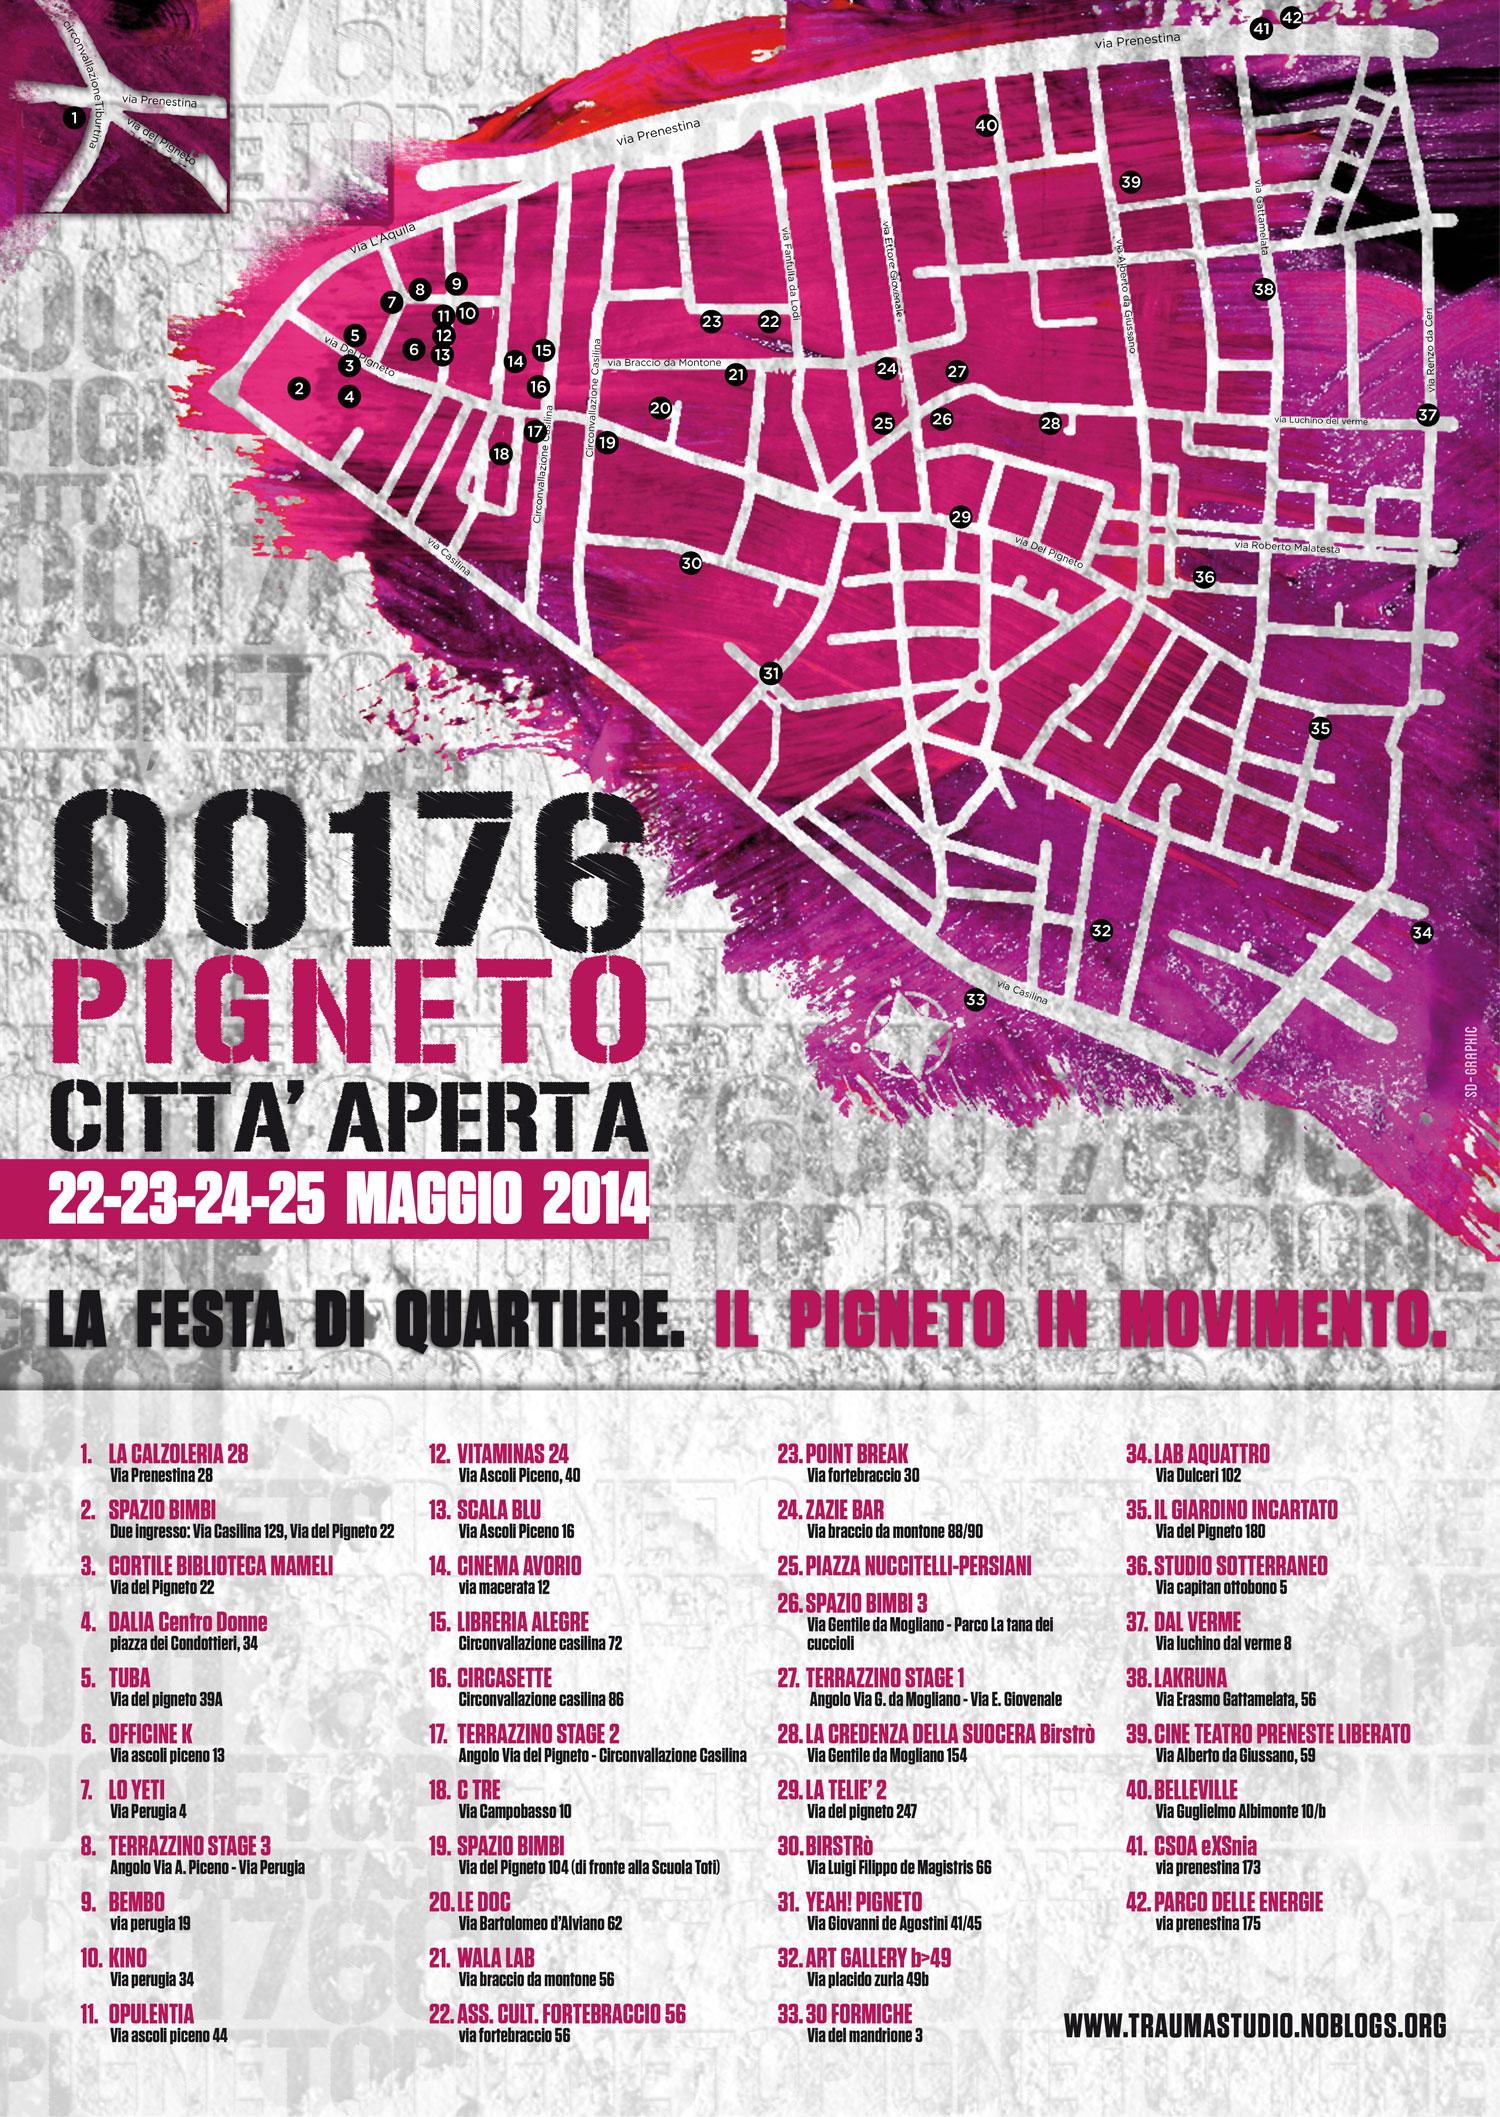 00176-pigneto-citta-aperta-2014-1